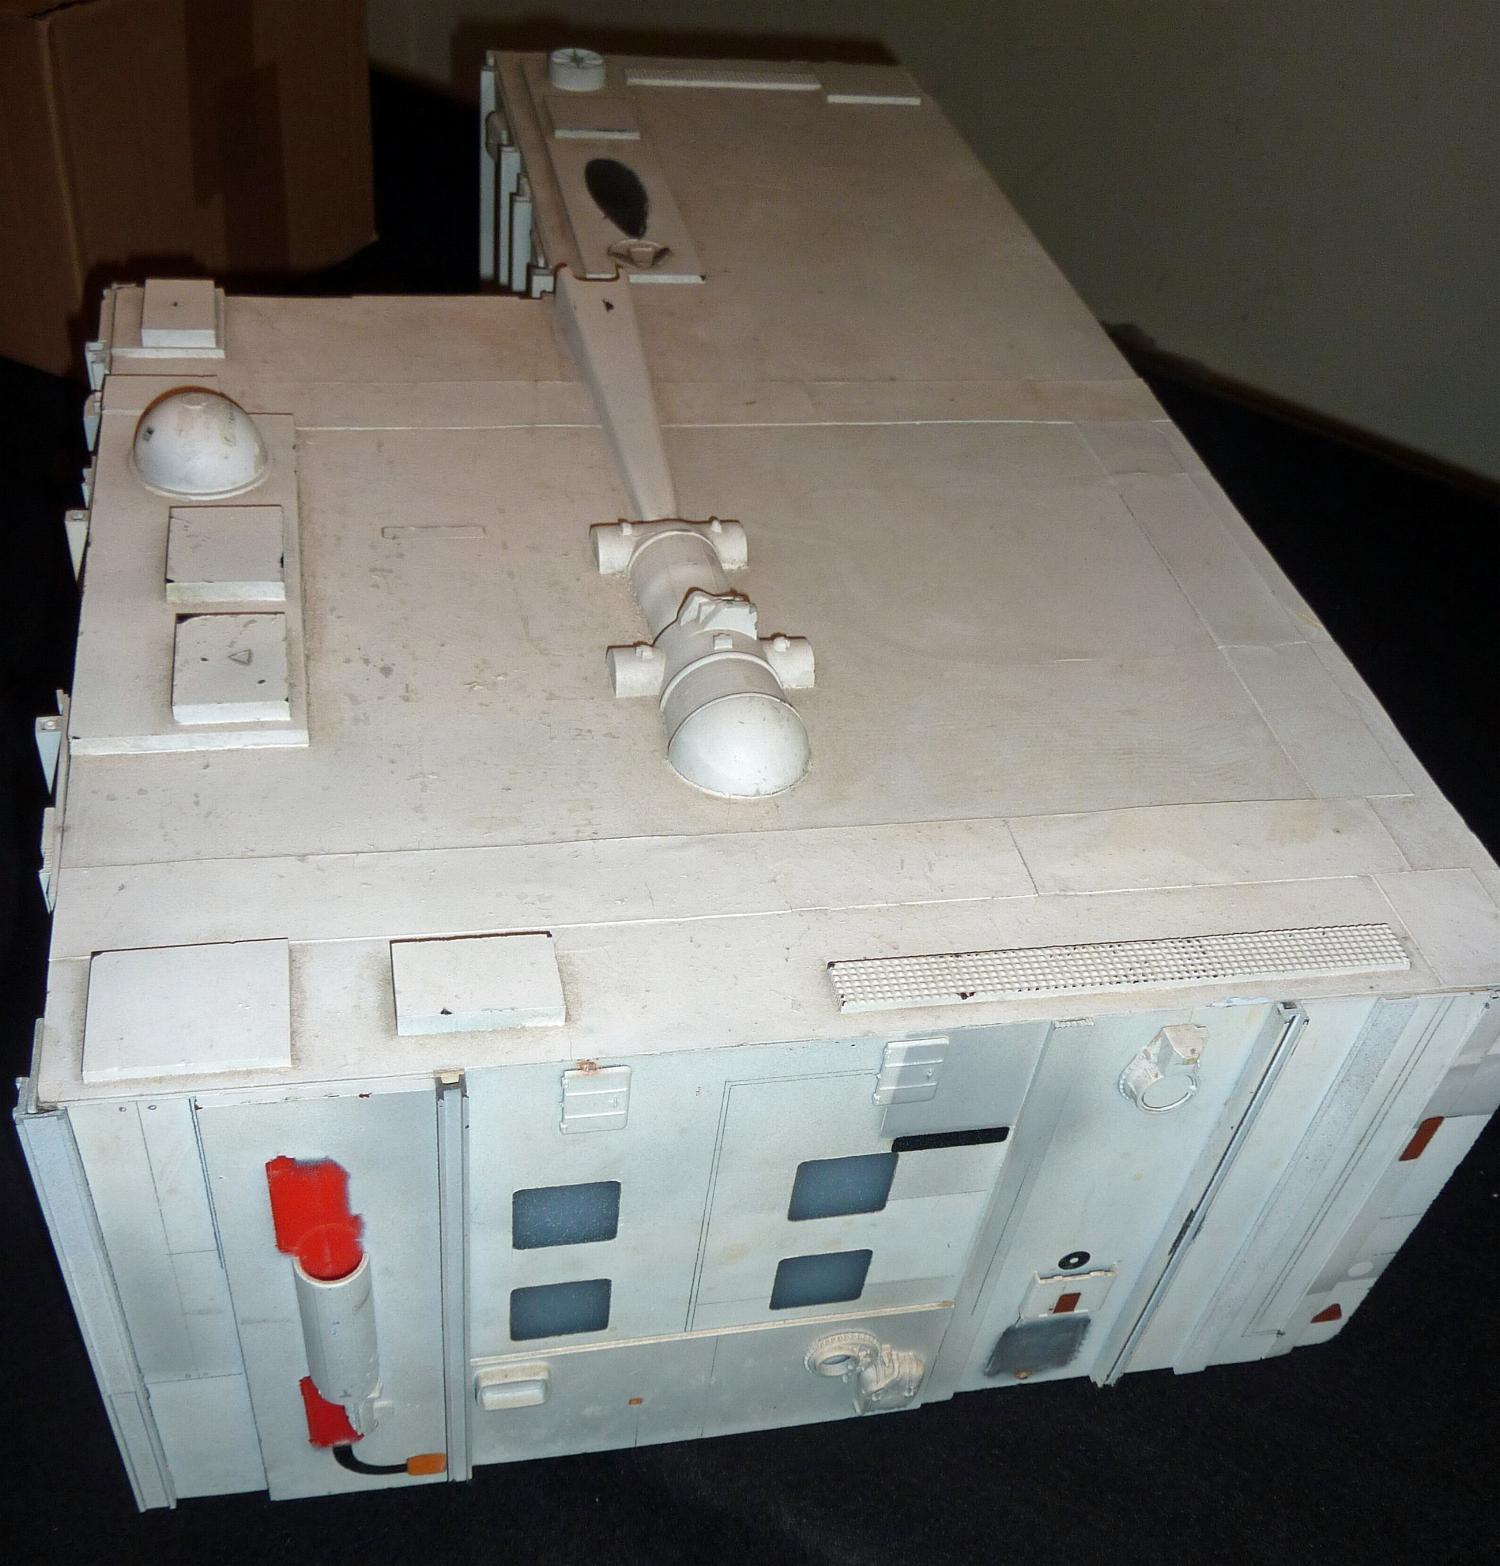 Space 1999 Catacombs Moonbase Alpha